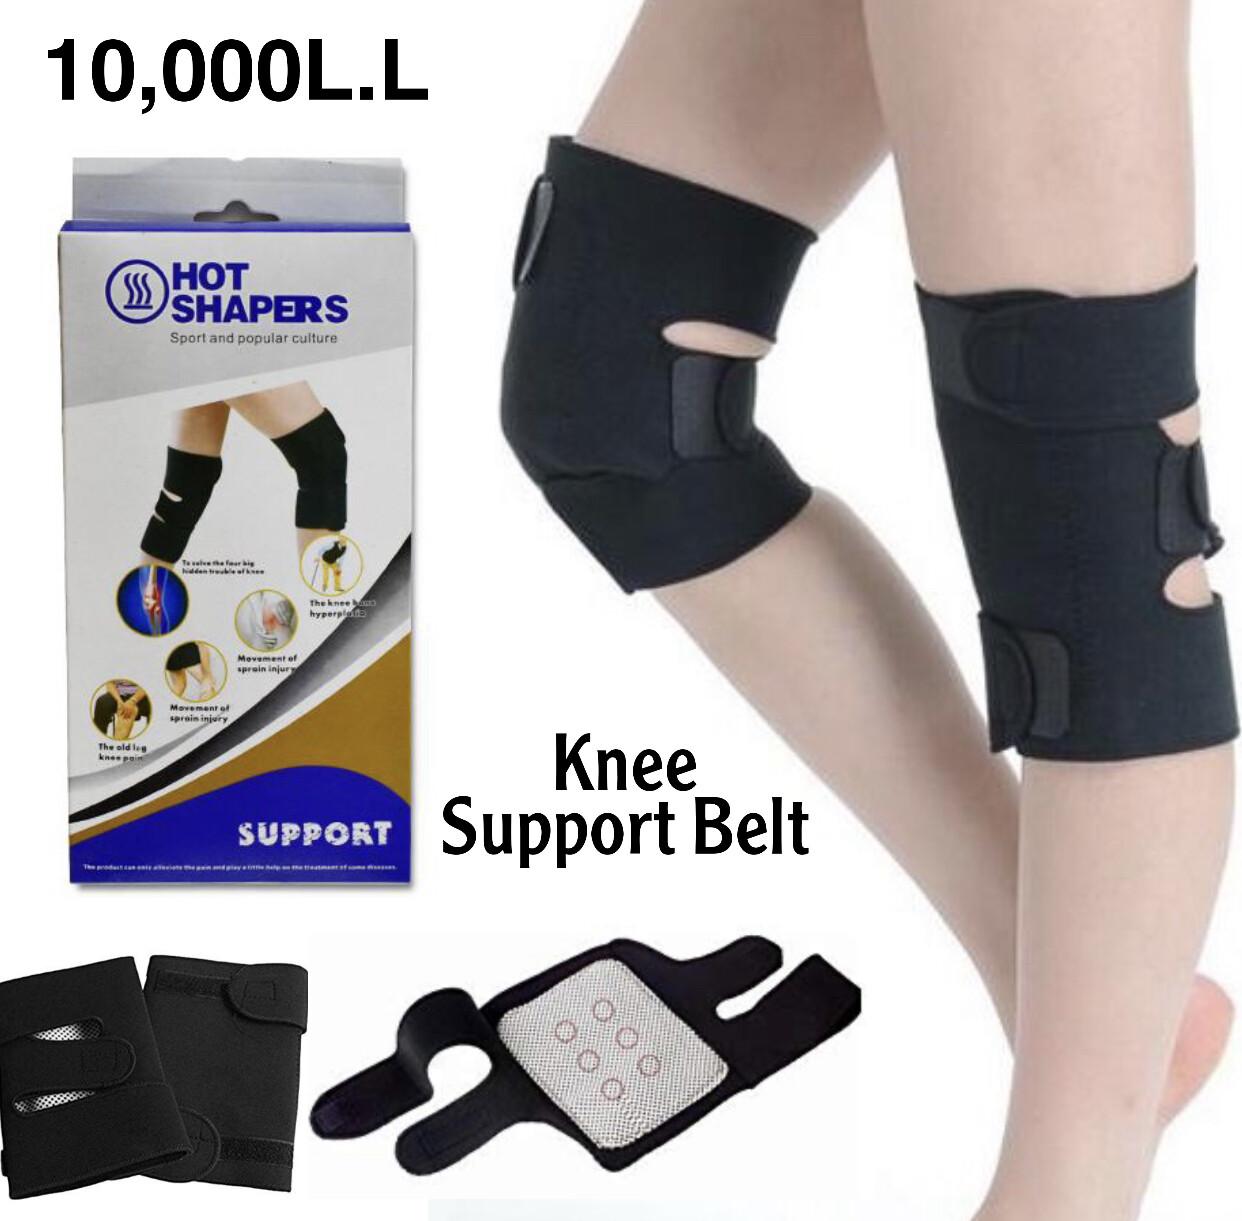 Knee Support Belt